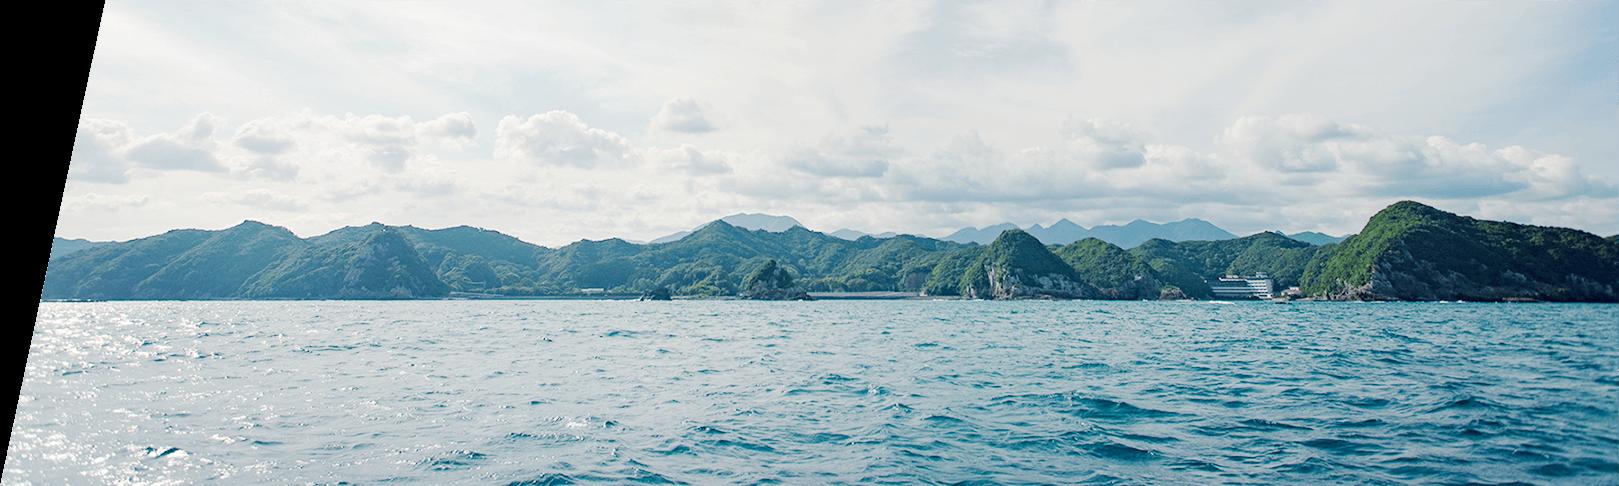 那智勝浦の海